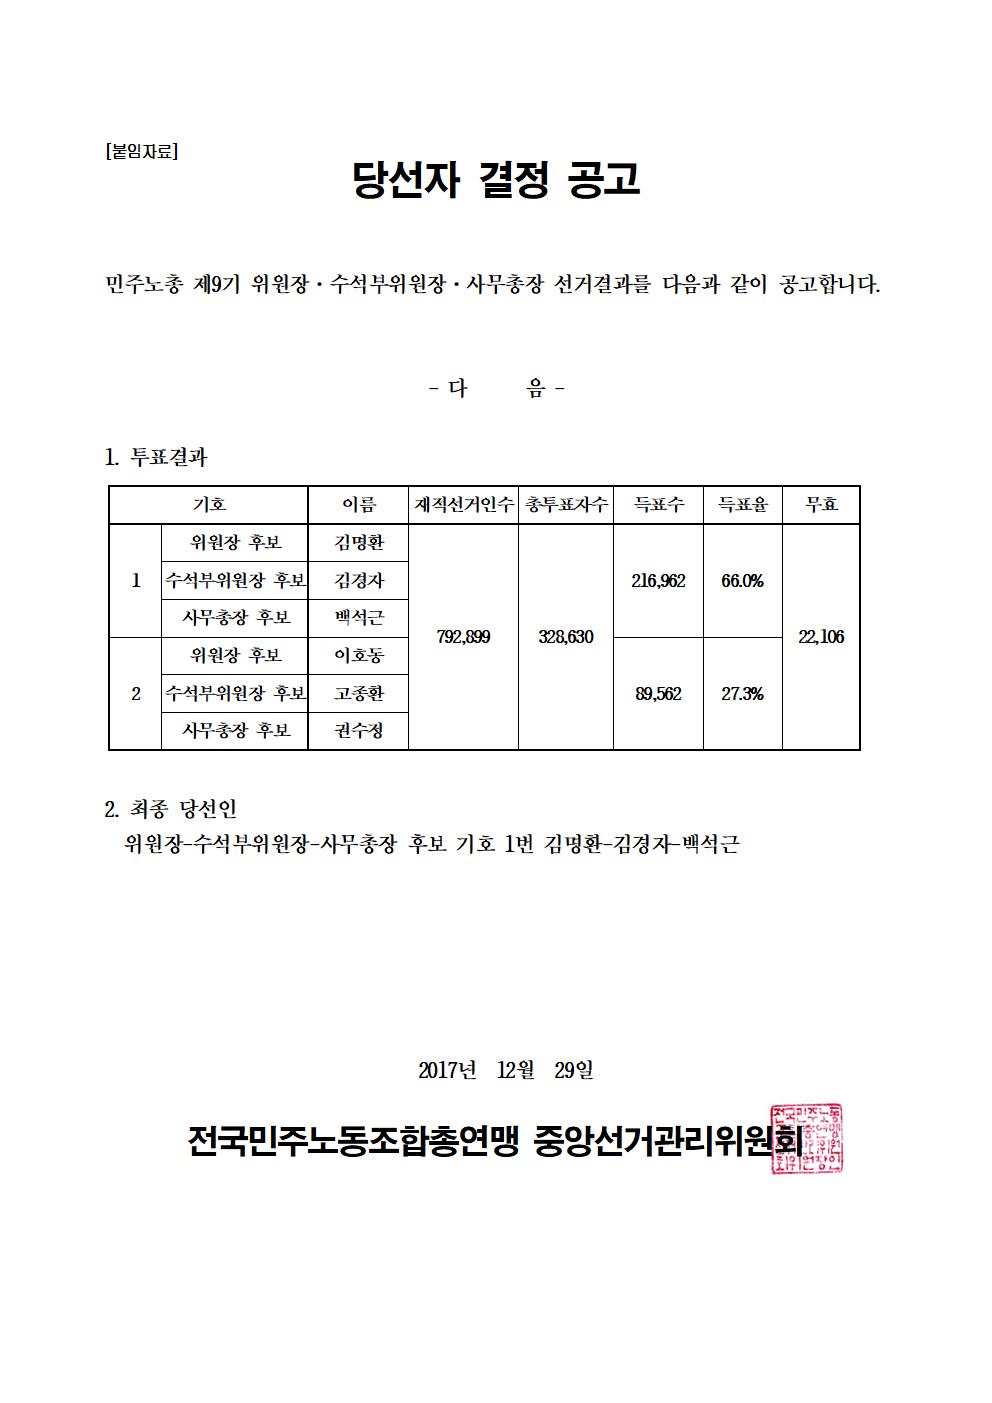 17kctu1004_민주노총 제9기 위원장-수석부위원장-사무총장 선거 당선자 결정 공고002.png